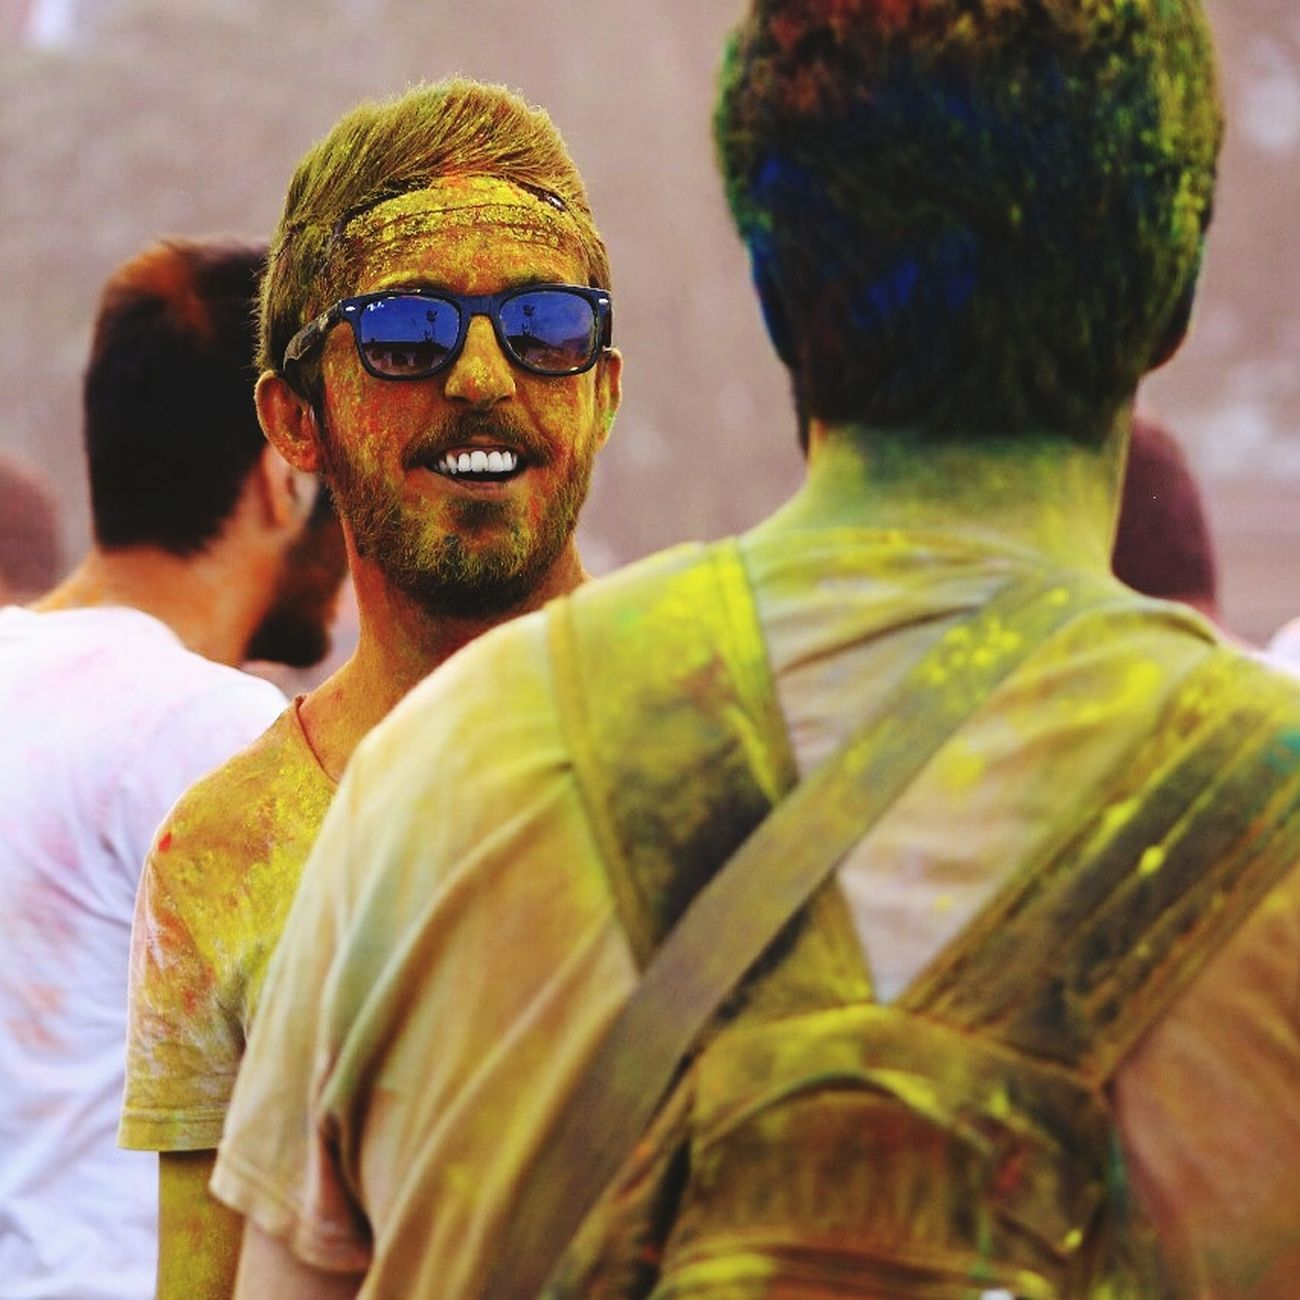 Genclikbesiktasta Colorup Festival Photography